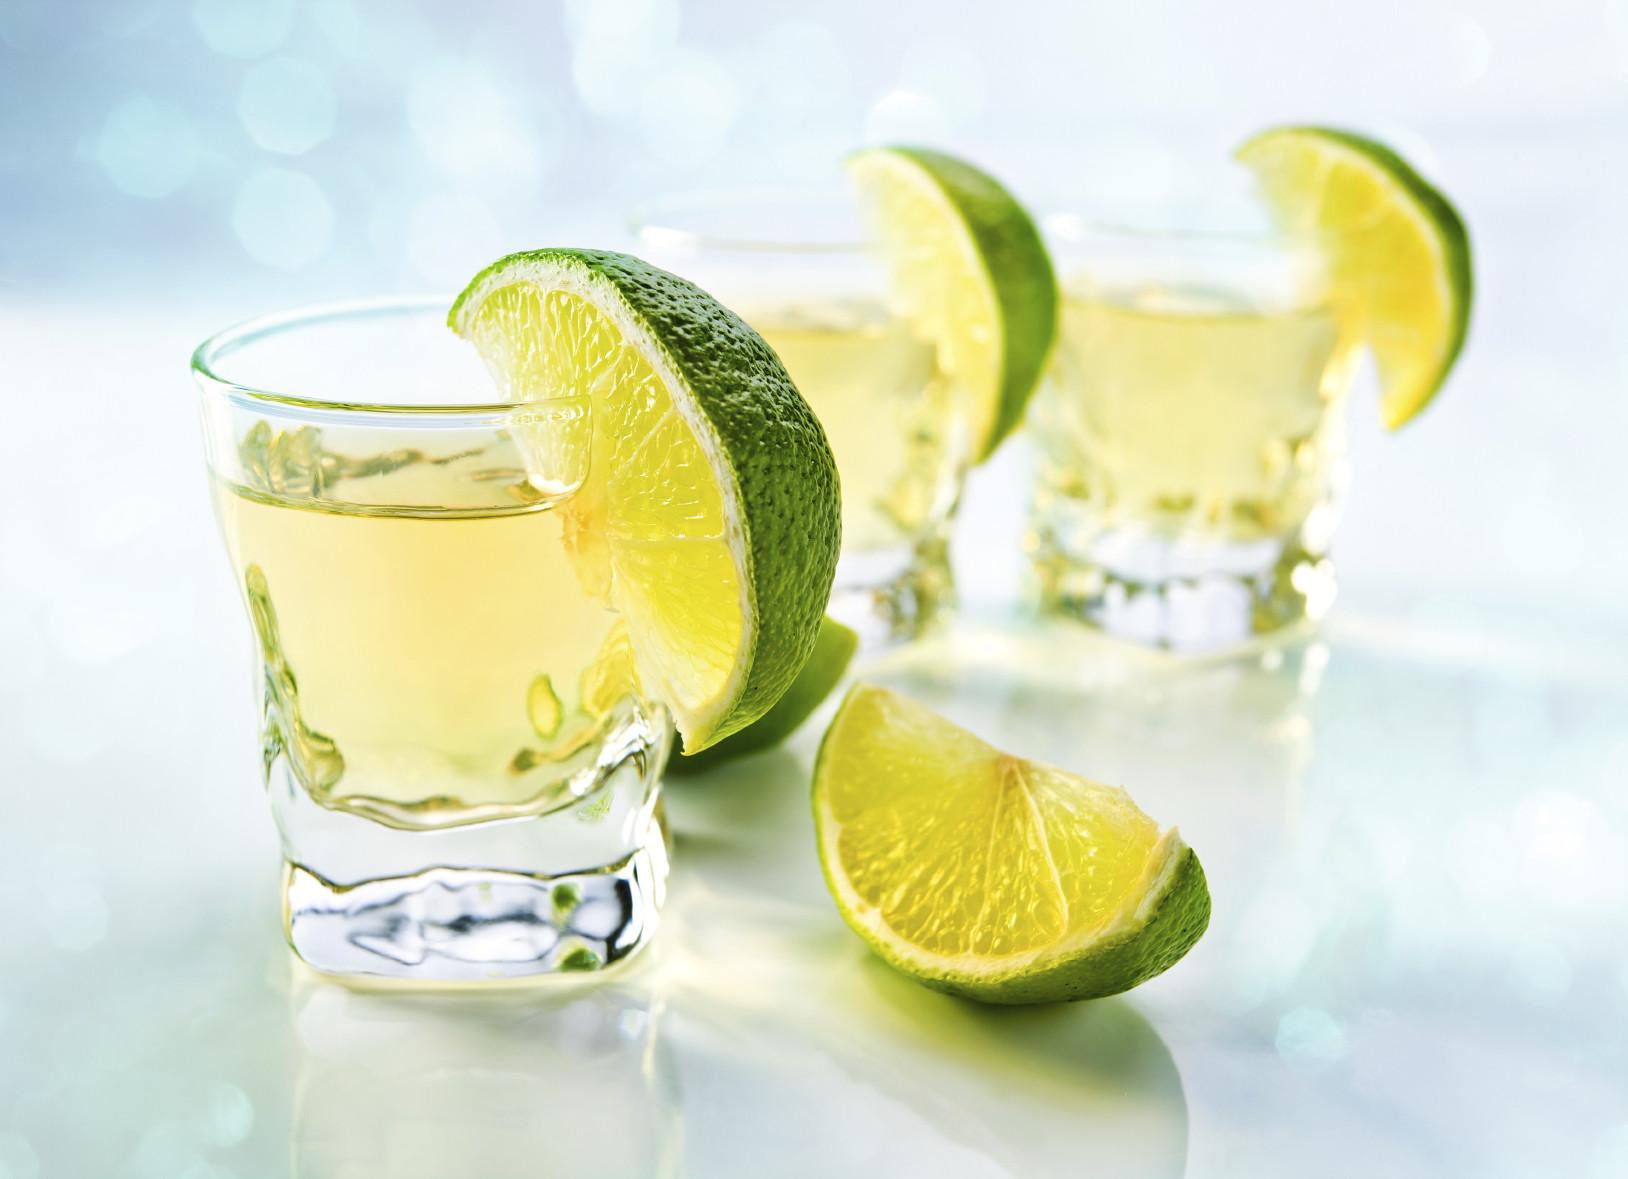 tequila-shot-alcoholic-drink-igorr1-iStock_000022606423_Medium